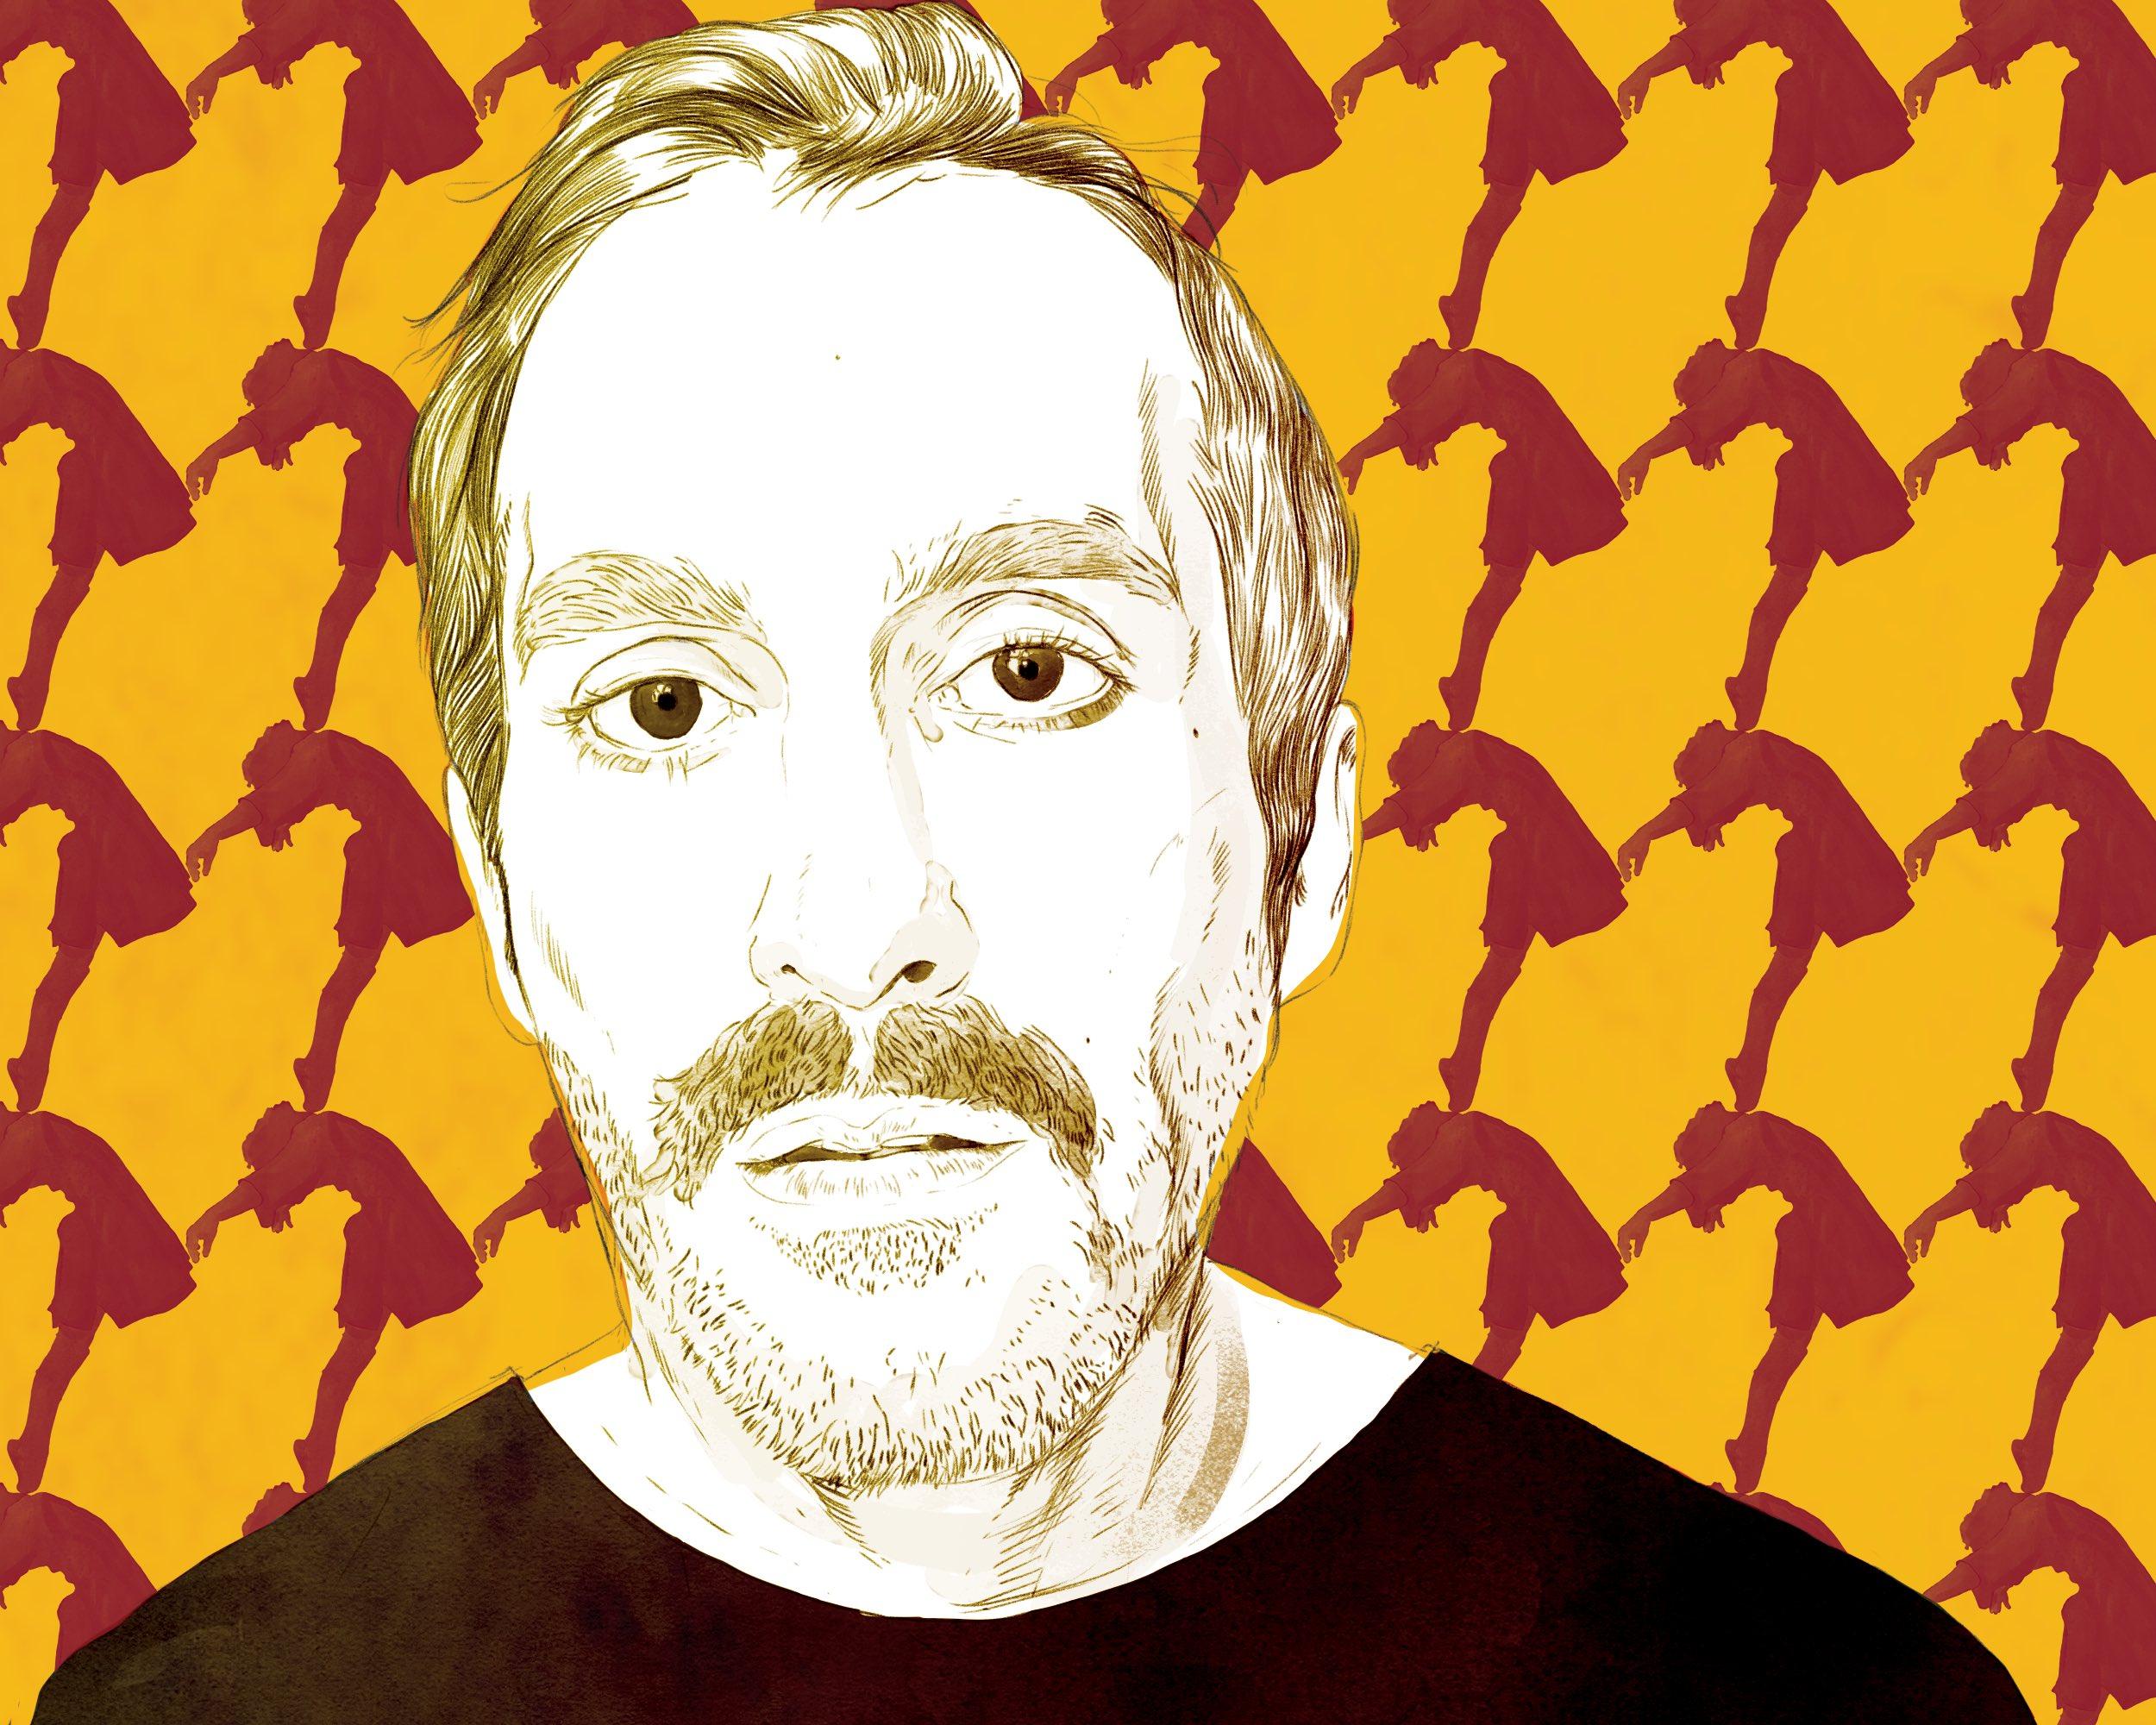 Levan Akin illustrated portrait